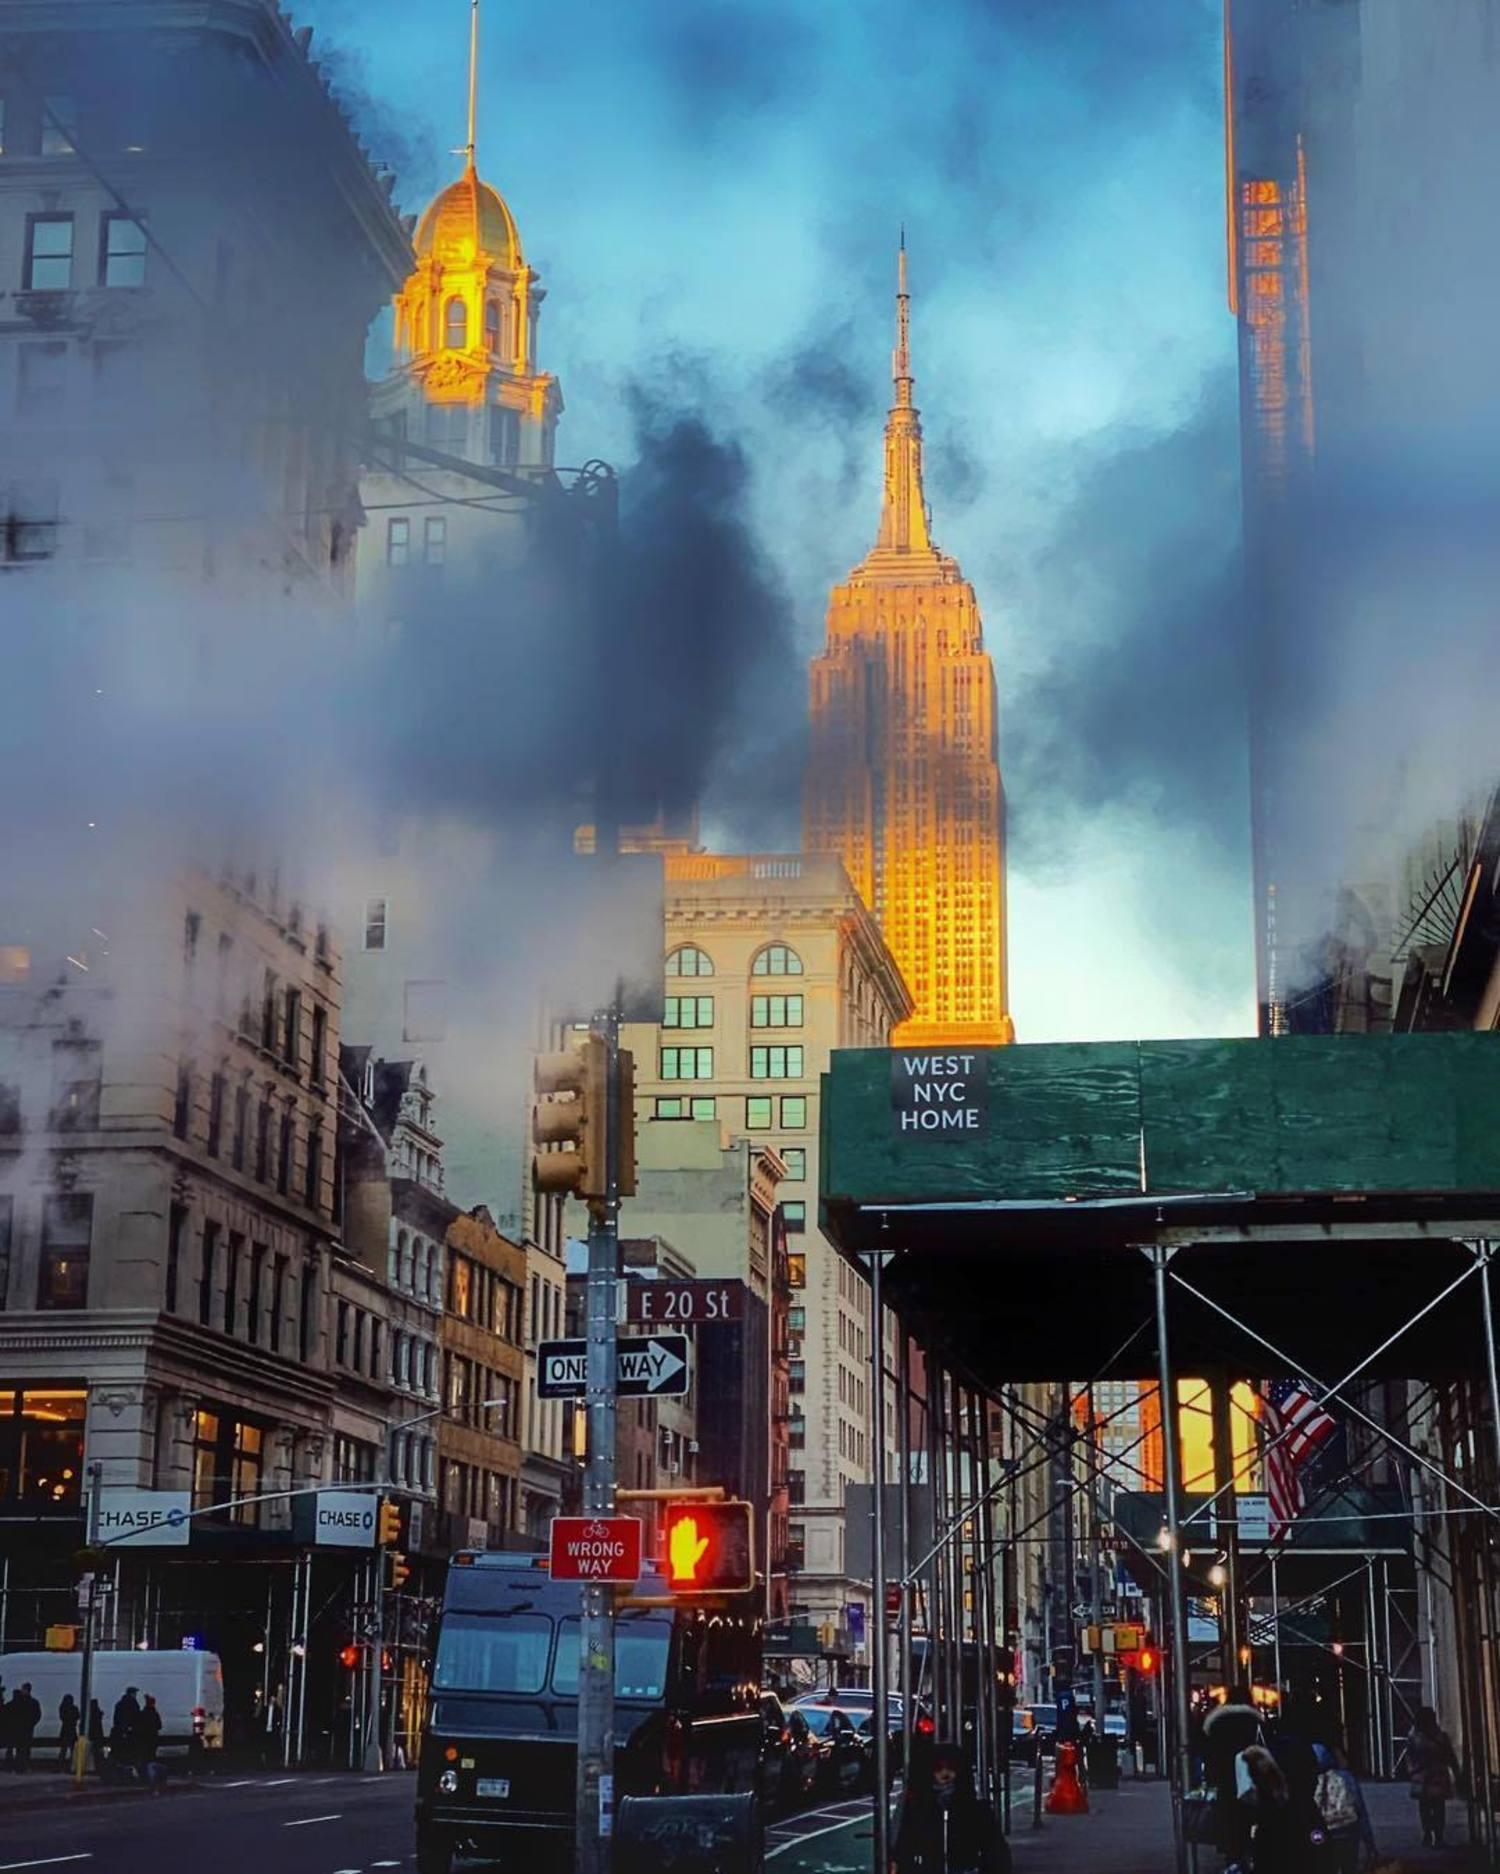 5th Avenue and 20th Street, Flatiron District, Manhattan